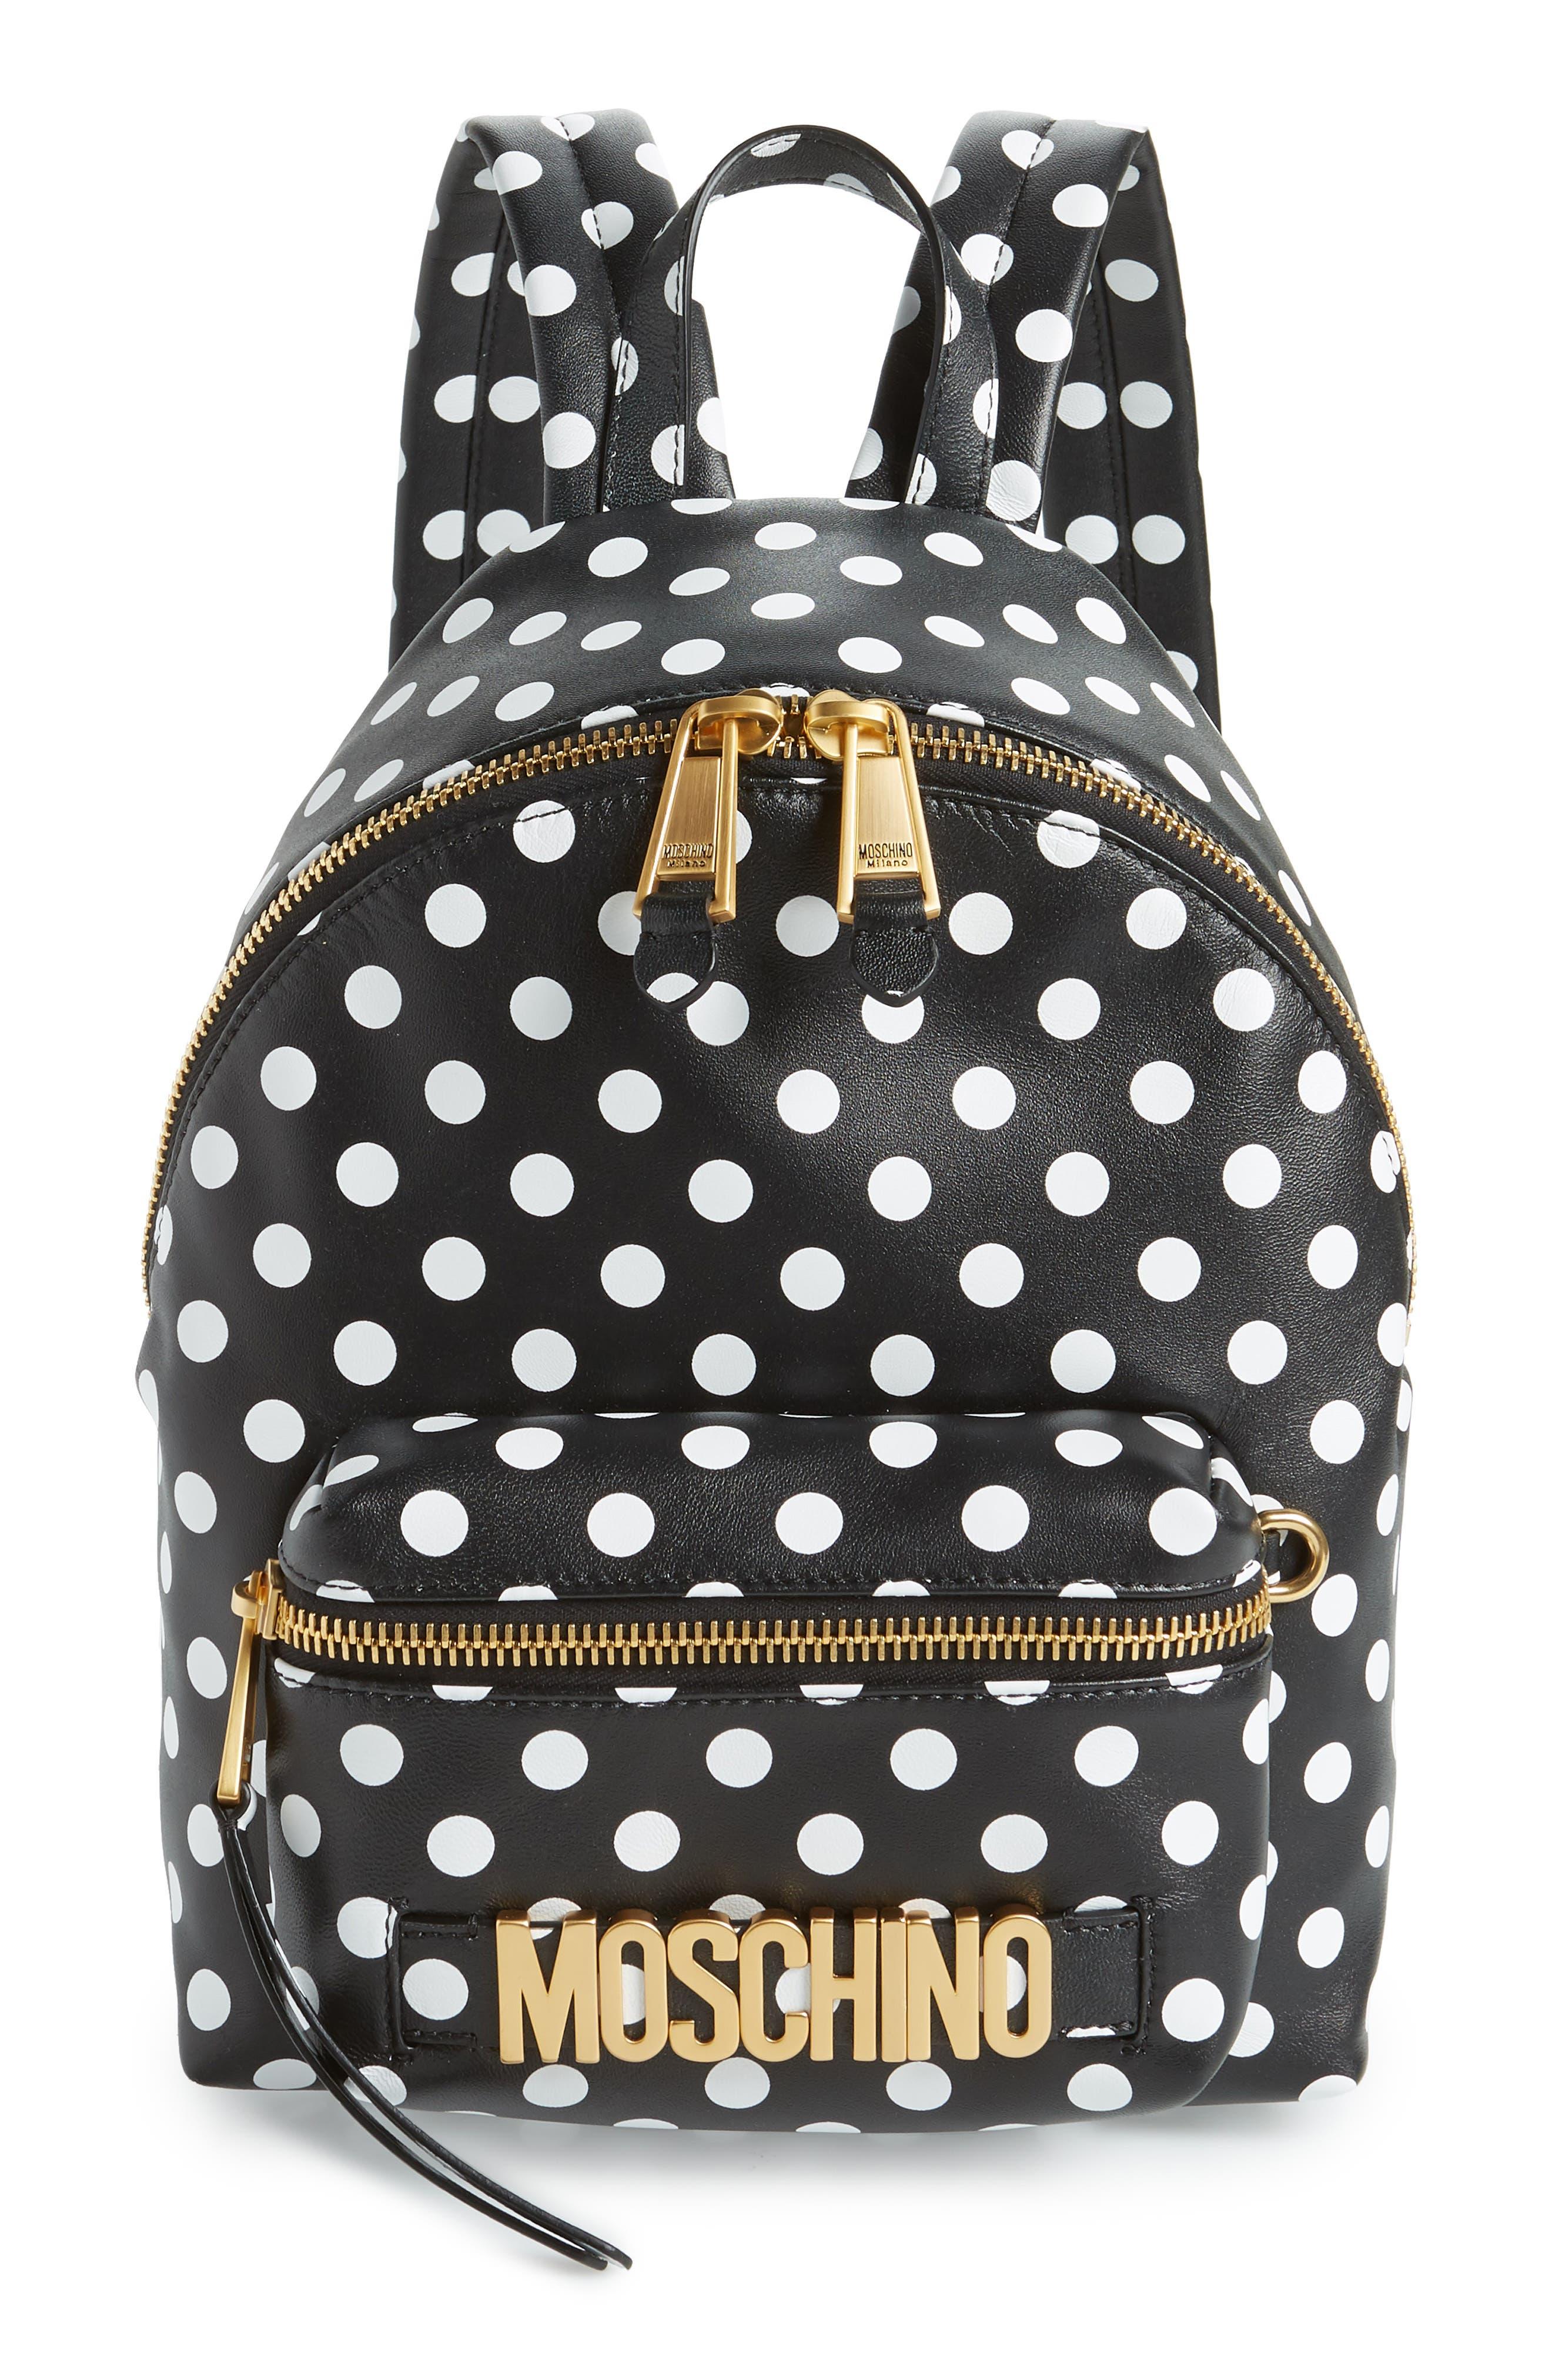 MOSCHINO Logo Polka Dot Backpack, Main, color, BLACK/ WHITE